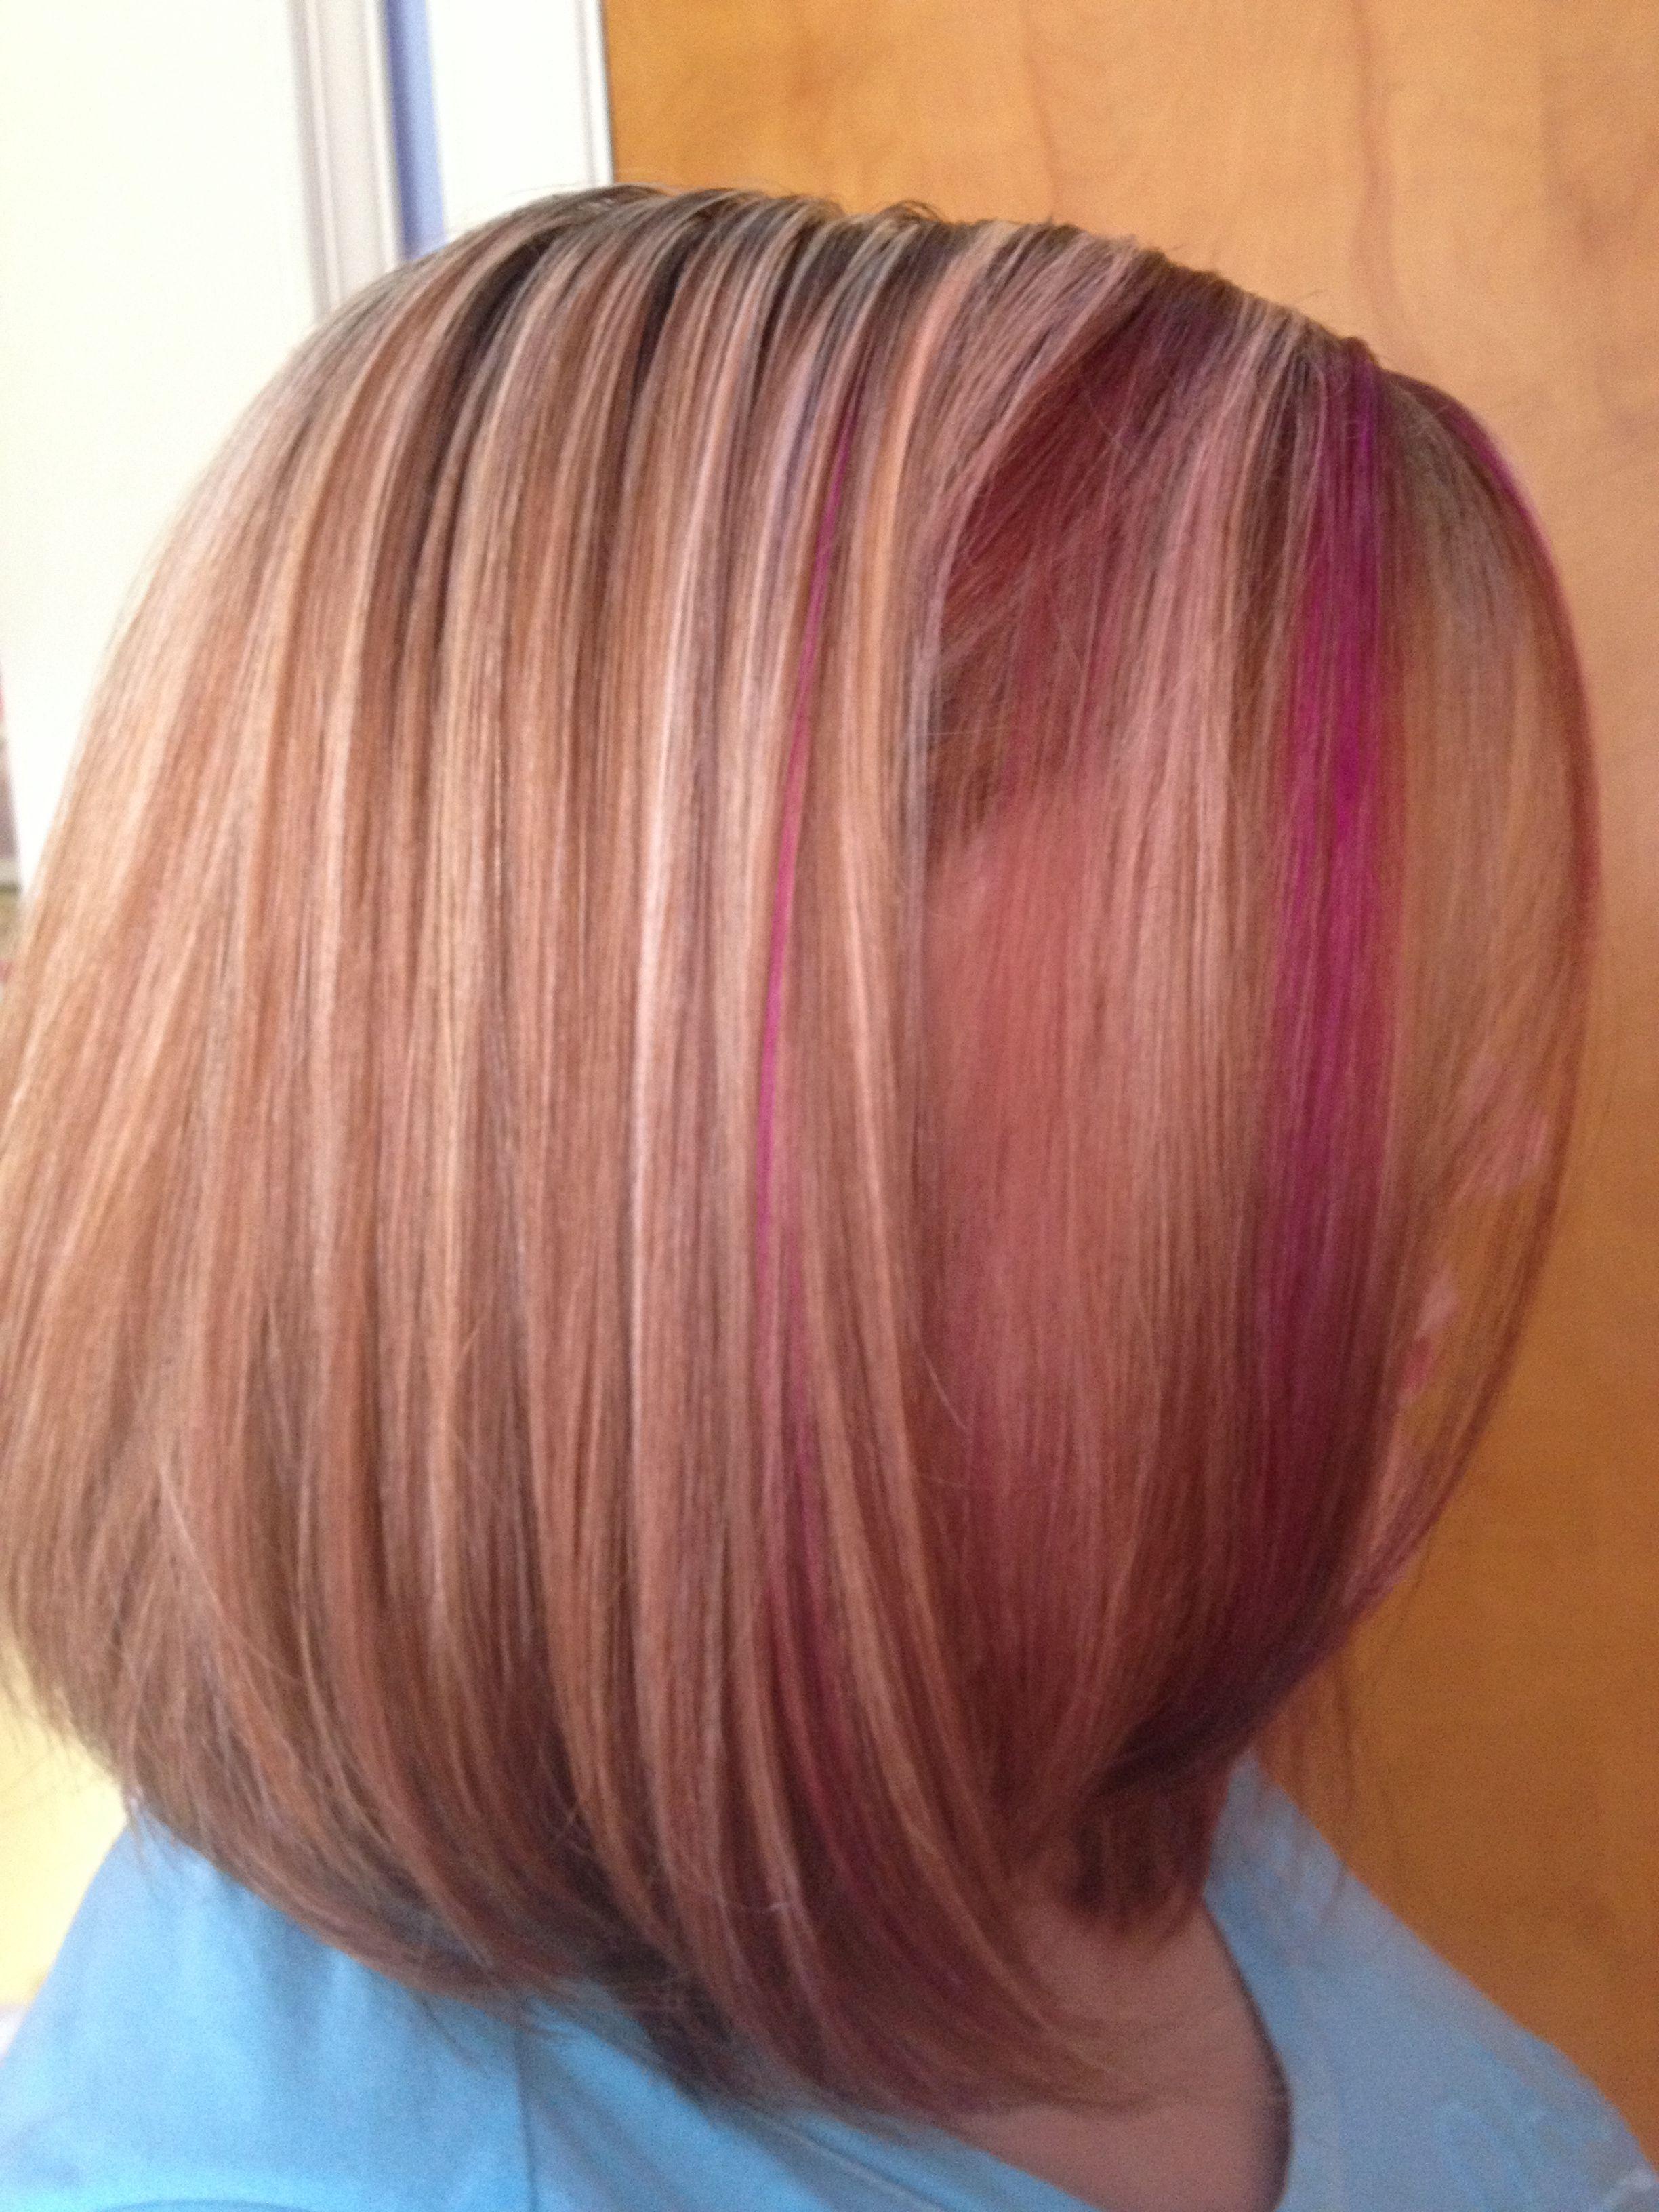 Blonde and fushia lowlights on razor haircut  Saraus hair creations